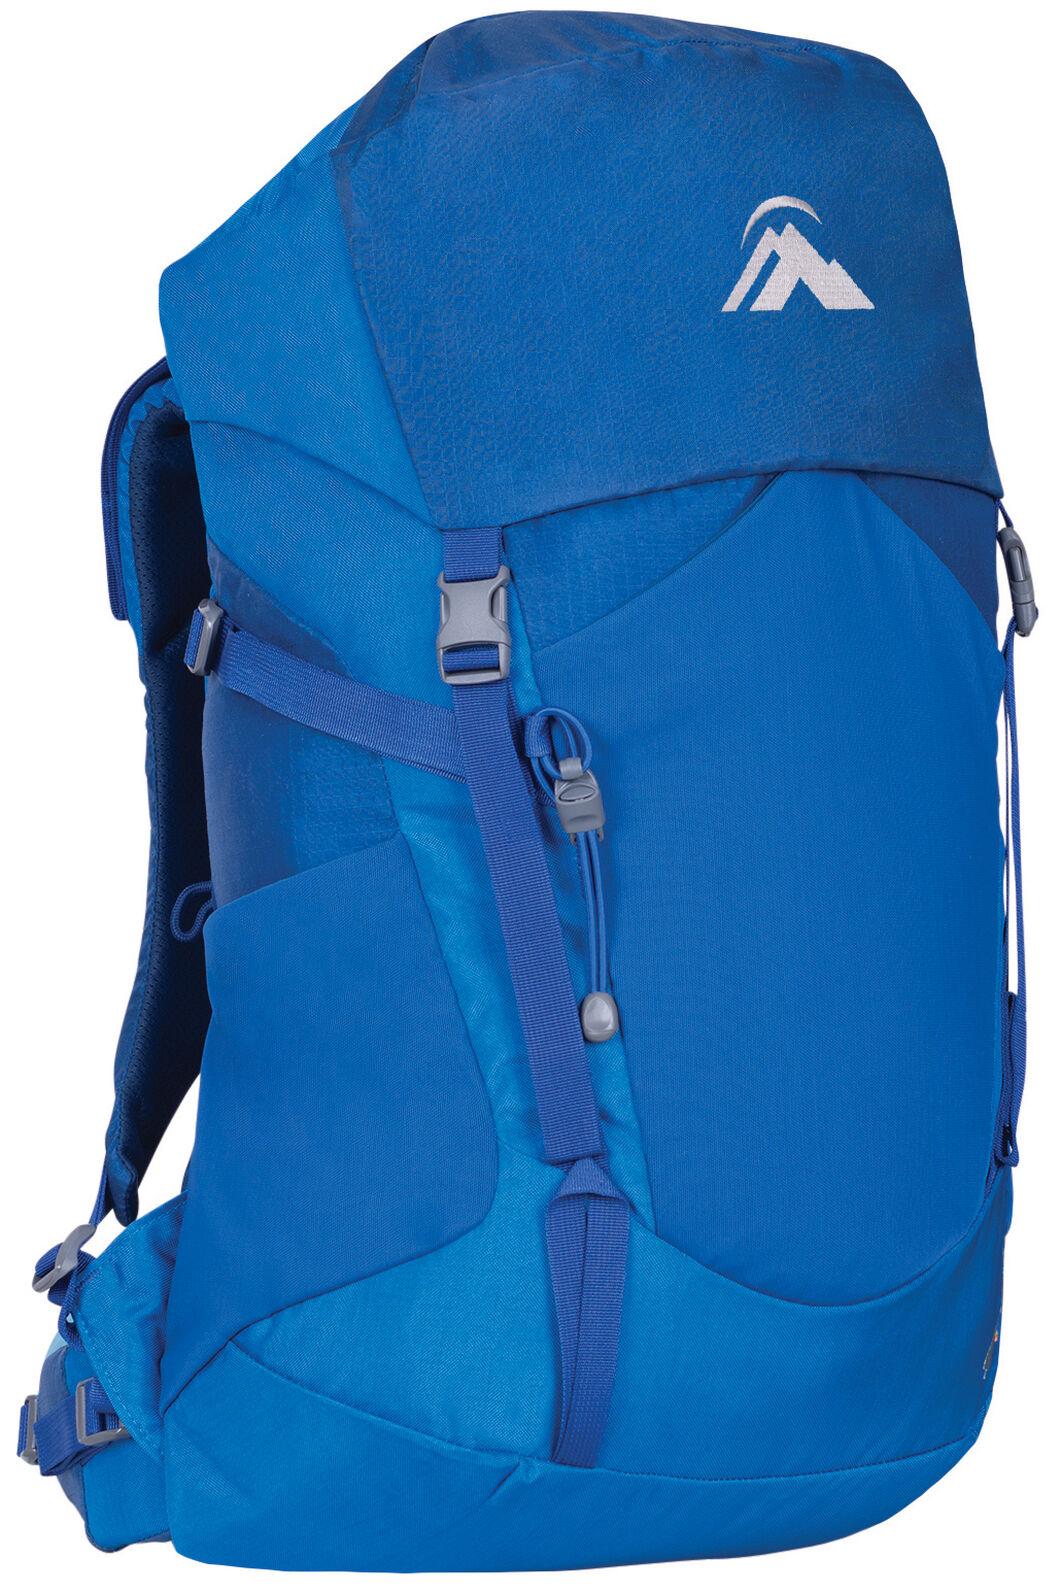 Macpac Torlesse 30L Junior Pack, Victoria Blue, hi-res